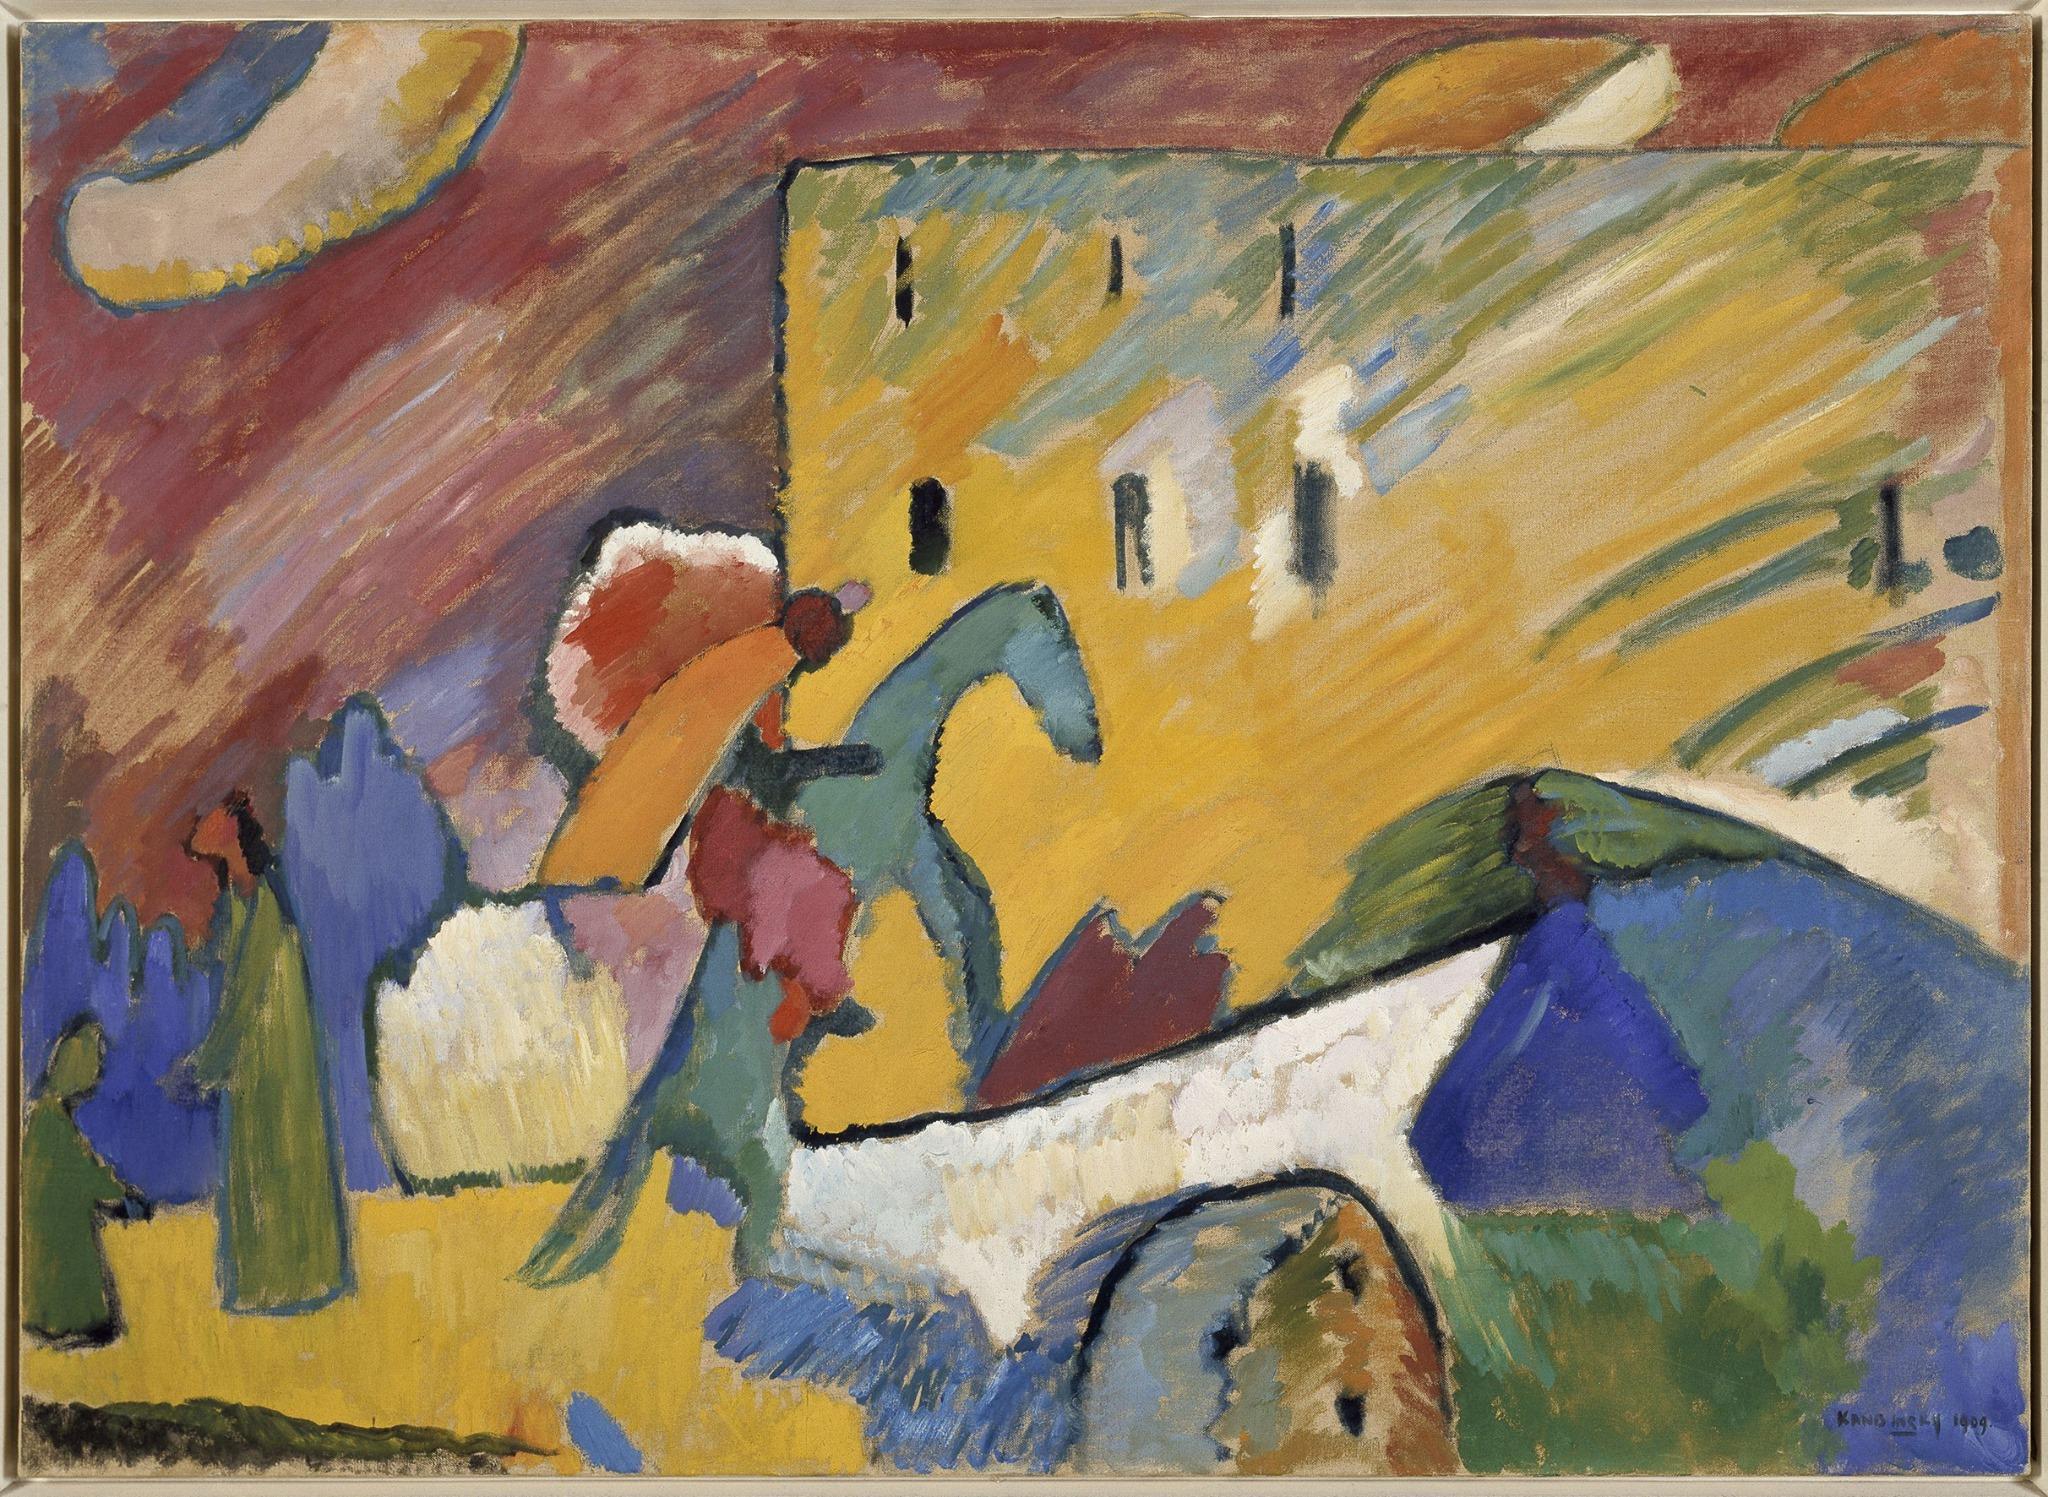 Wassily Kandinsky - Improvisación III (1909)  © Wassily Kandinsky, VEGAP. Madrid, 2015.